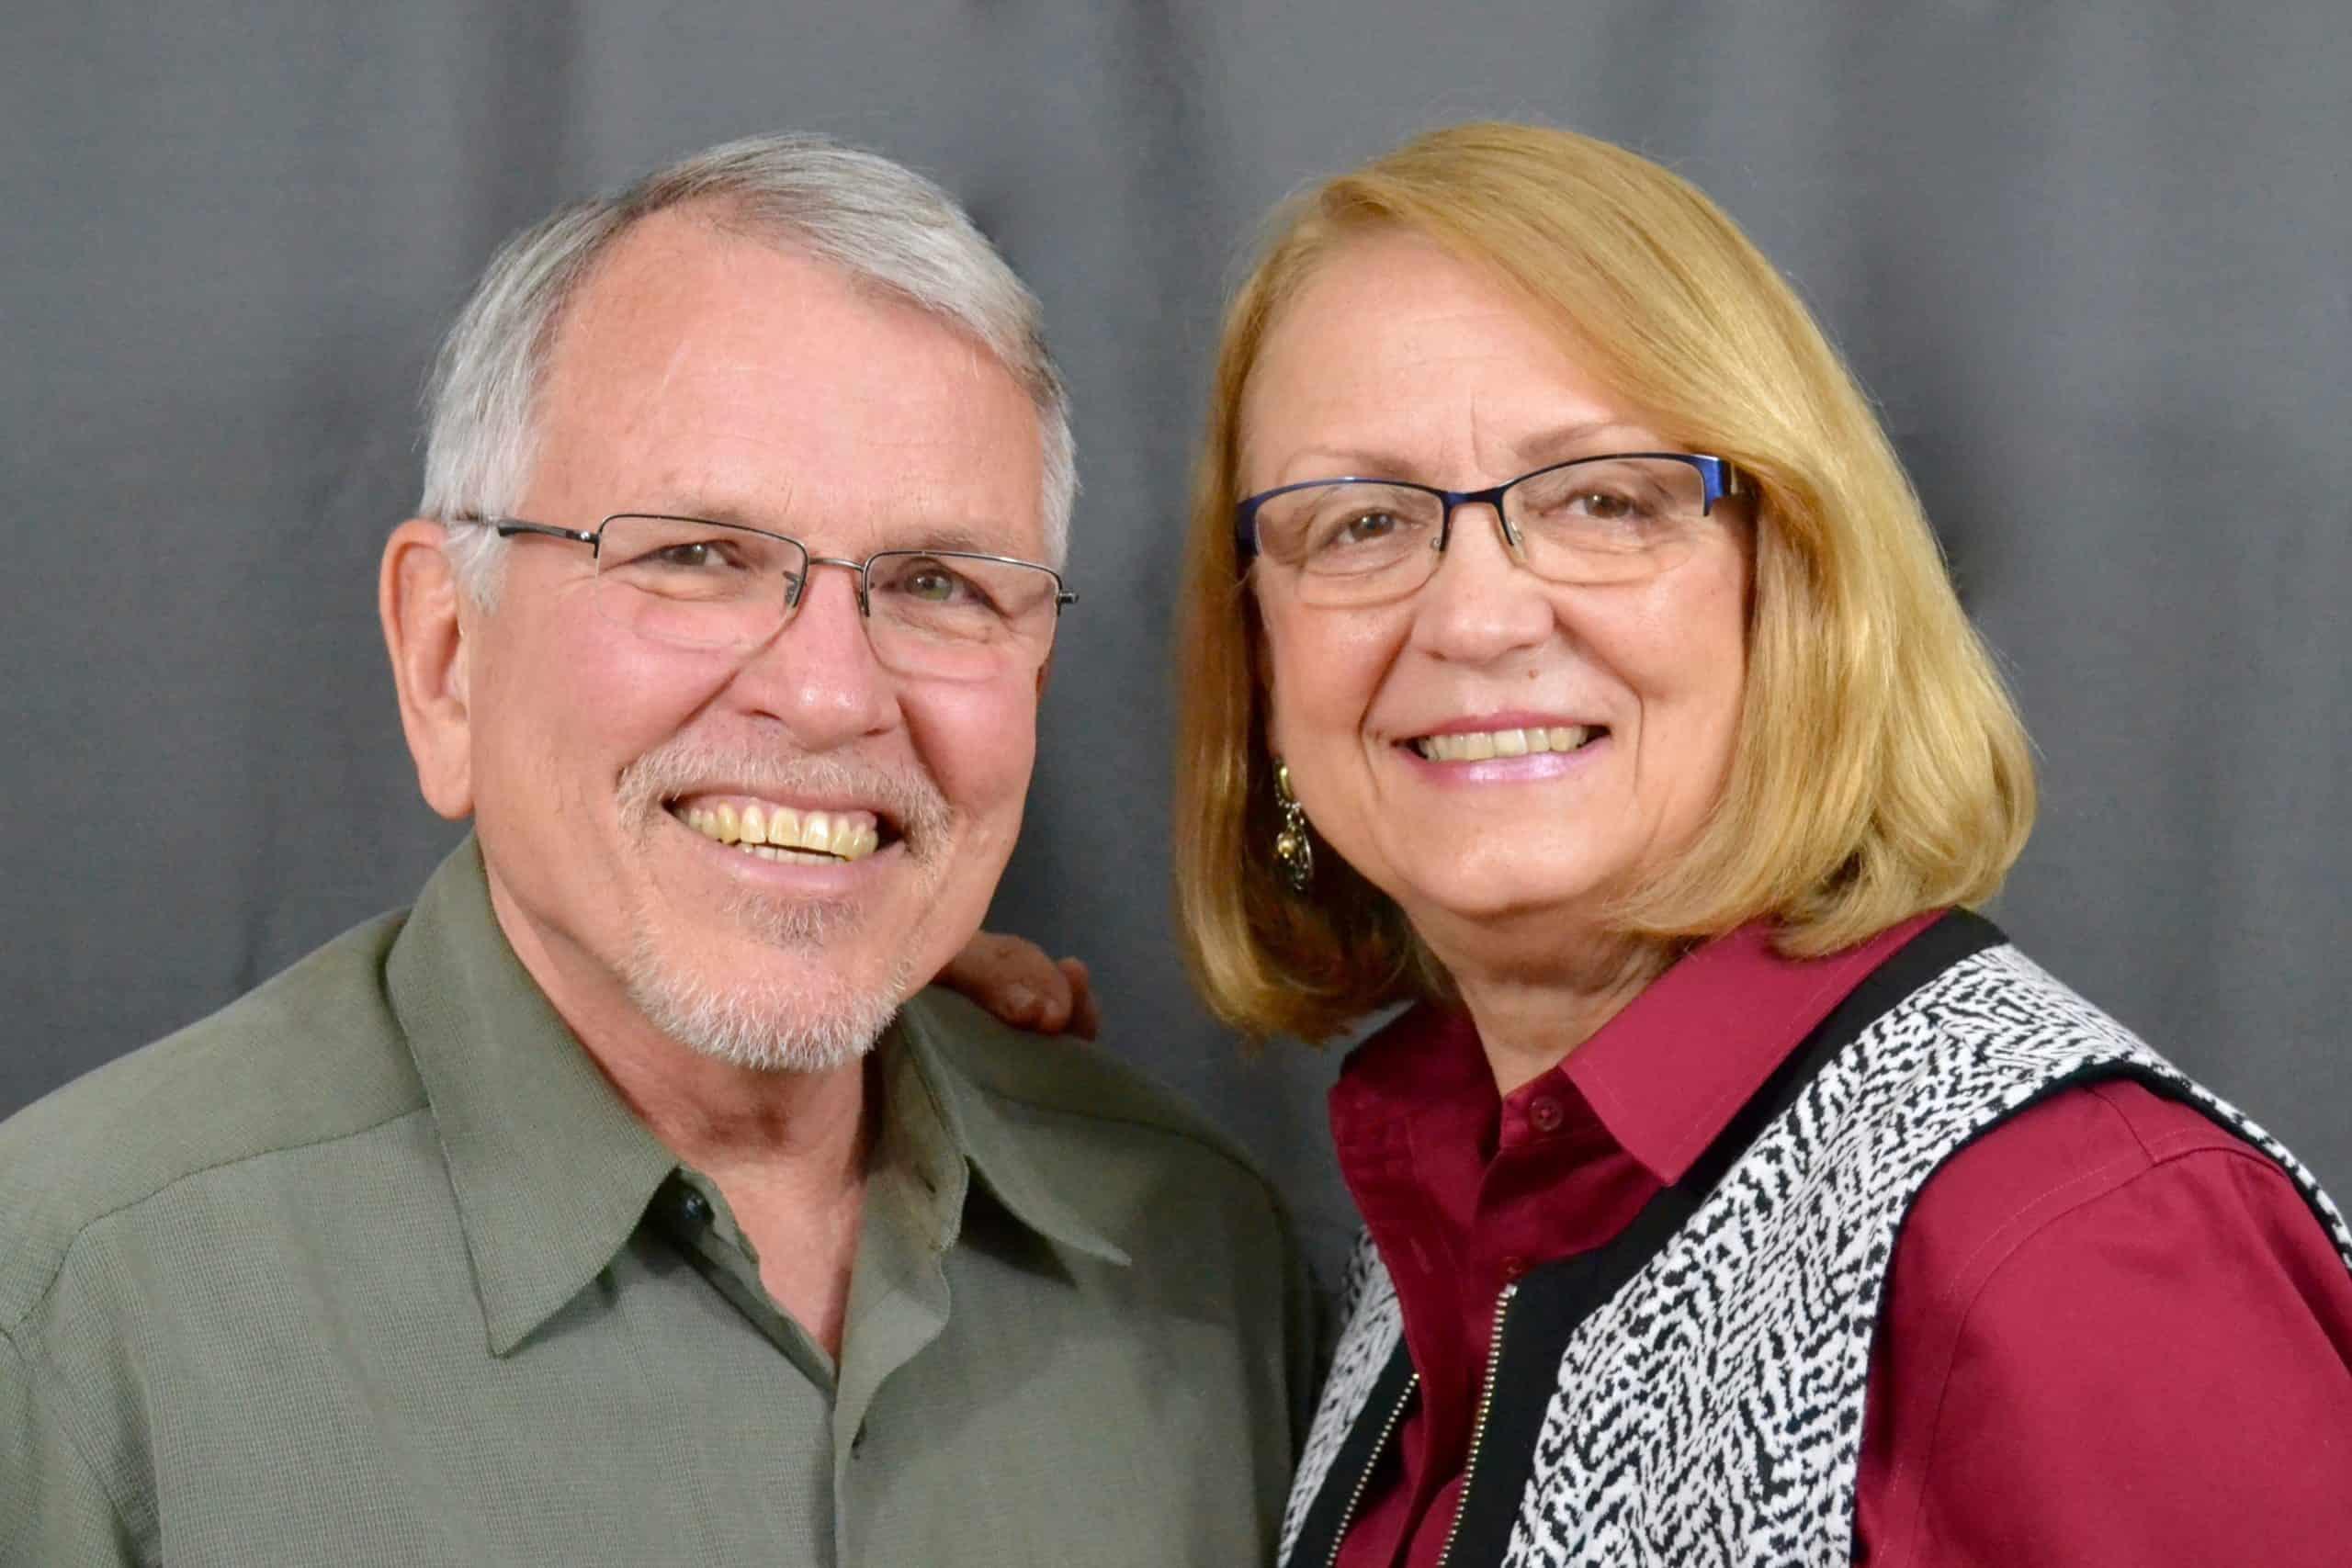 David and Janice Waltz